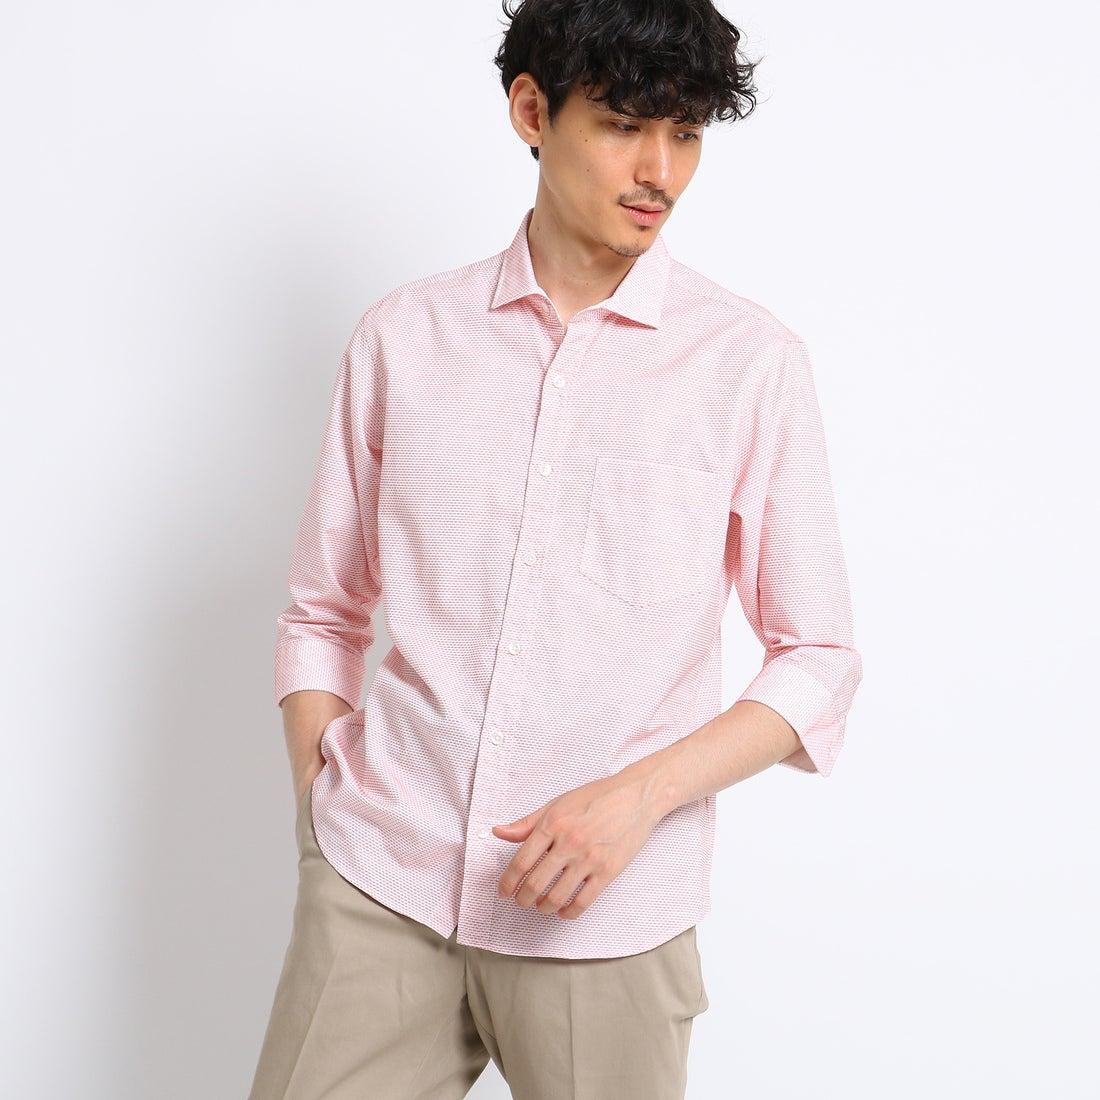 【SALE 50%OFF】タケオ キクチ TAKEO KIKUCHI ステッチボーダー7分袖シャツ [ メンズ シャツ 7分袖 ] (ピンク)